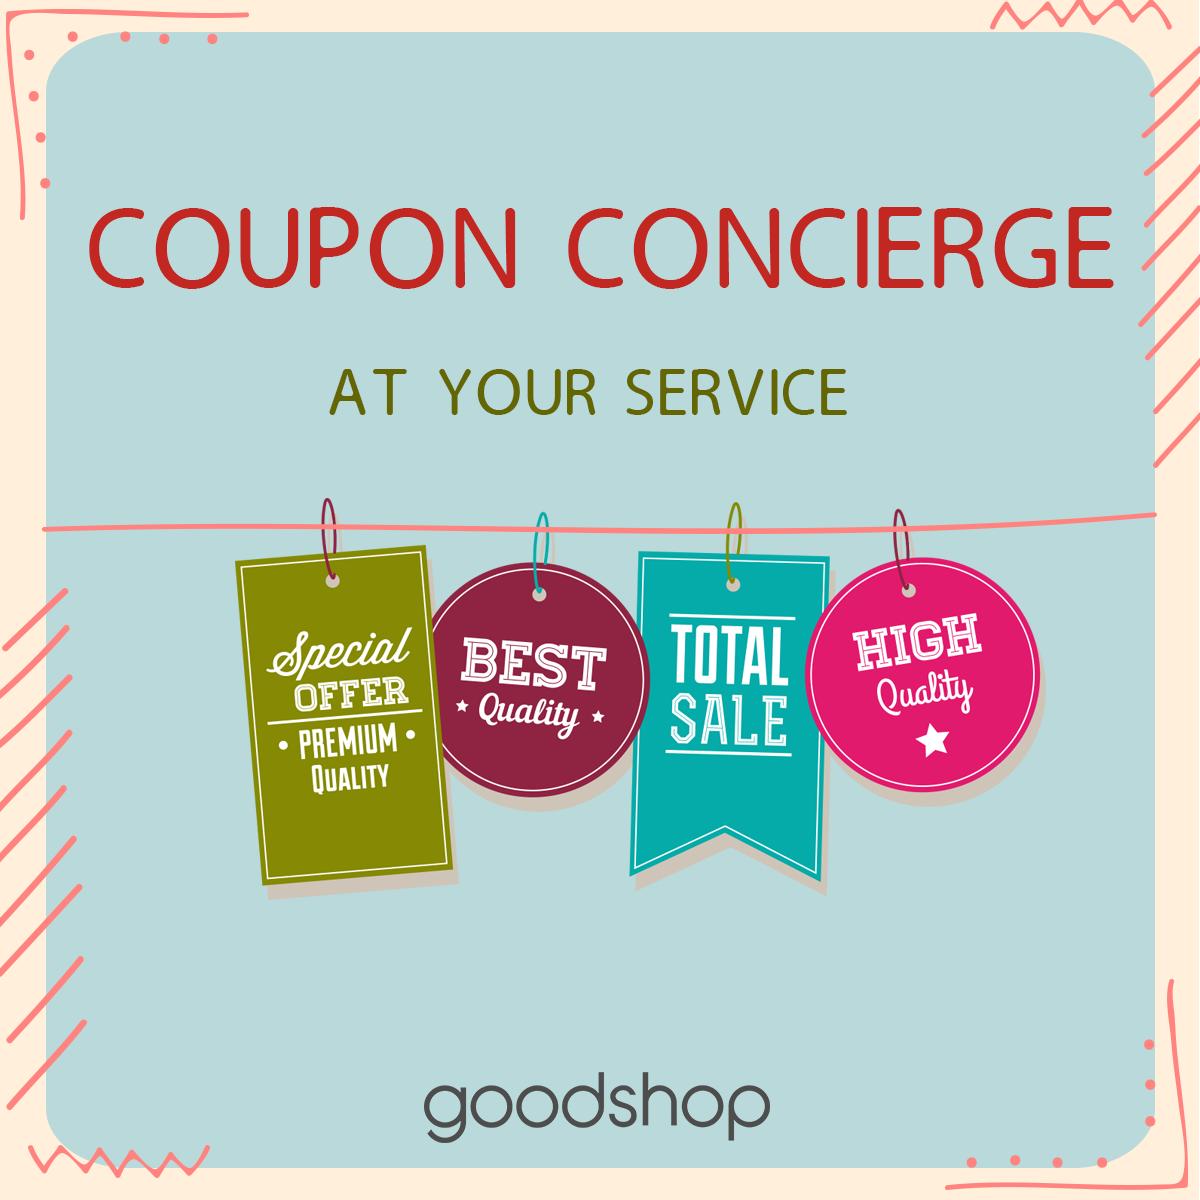 concierge-facebook-1200x1200-02.png